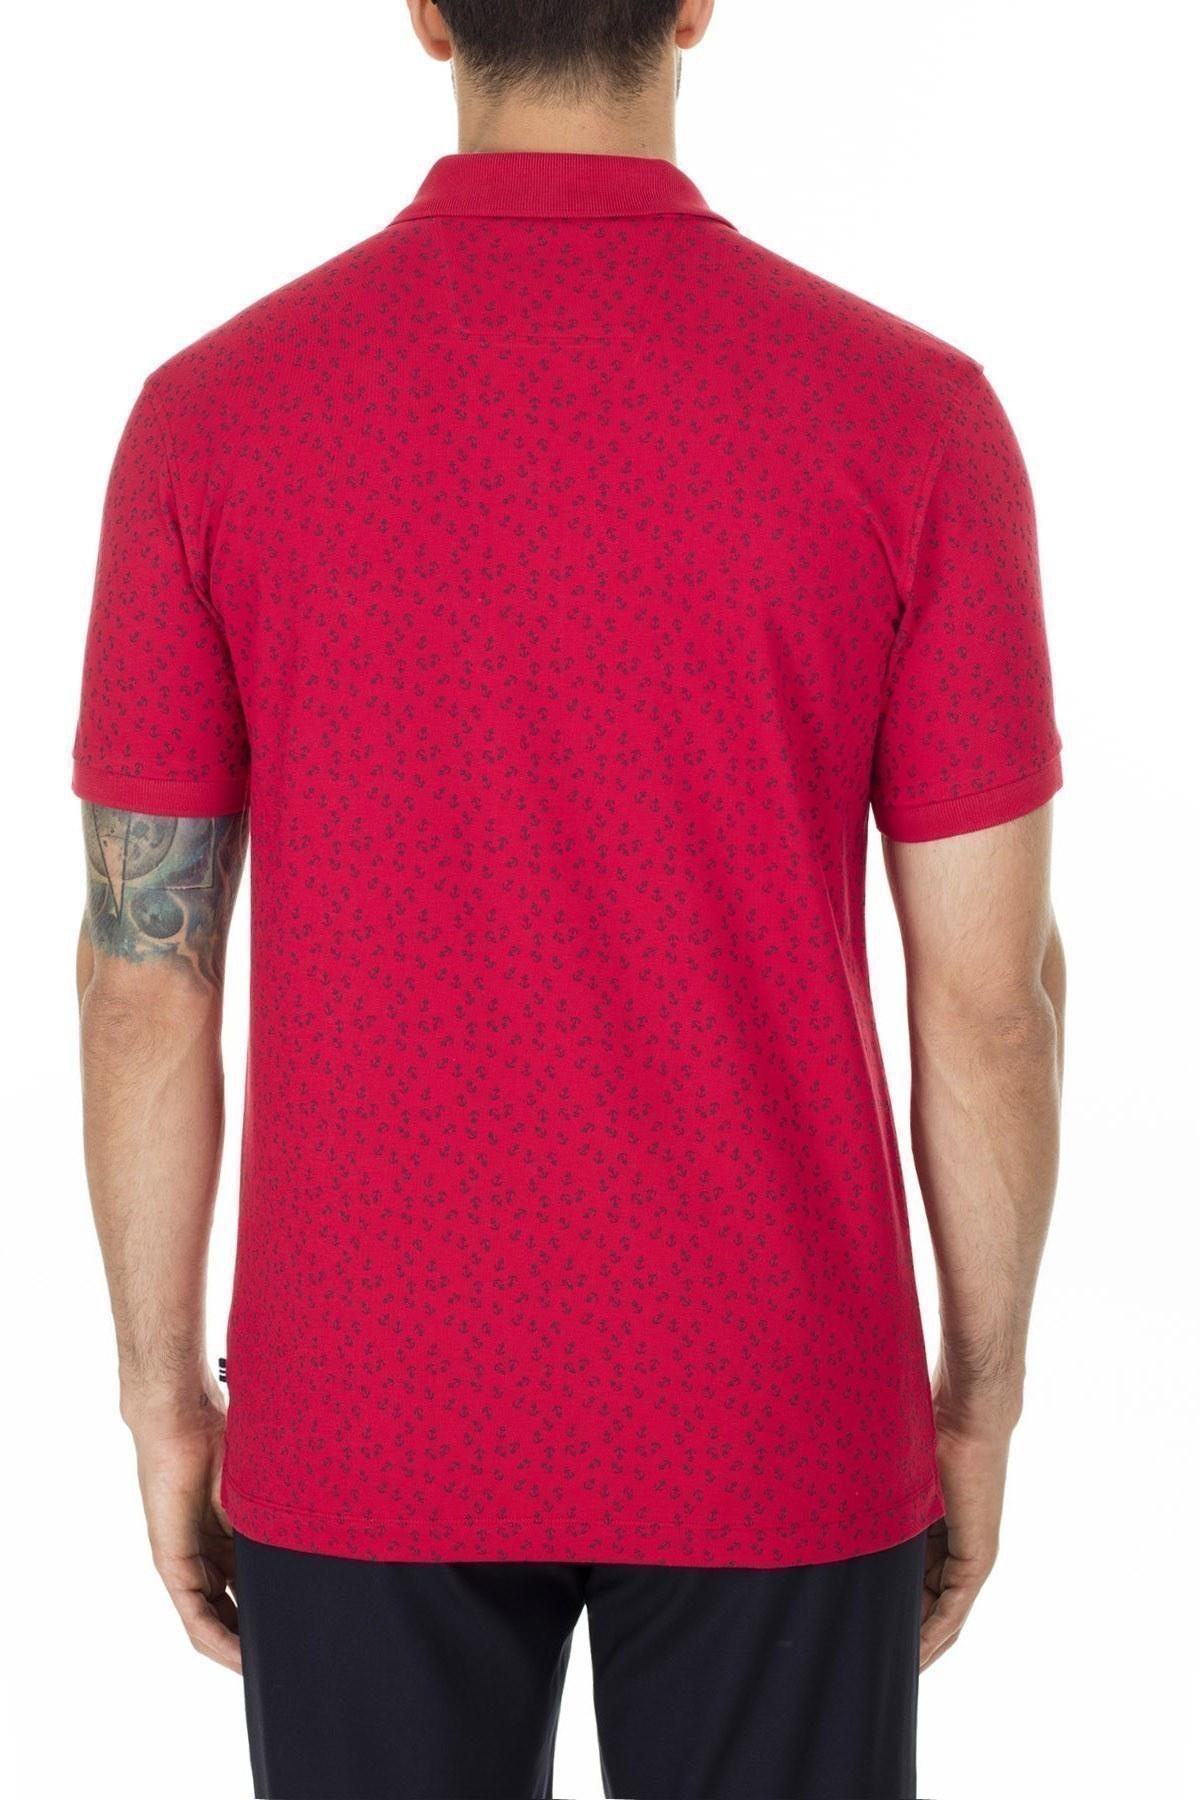 Nautica Pamuklu Slim Fit T Shirt Erkek Polo K01021T 6NR KIRMIZI